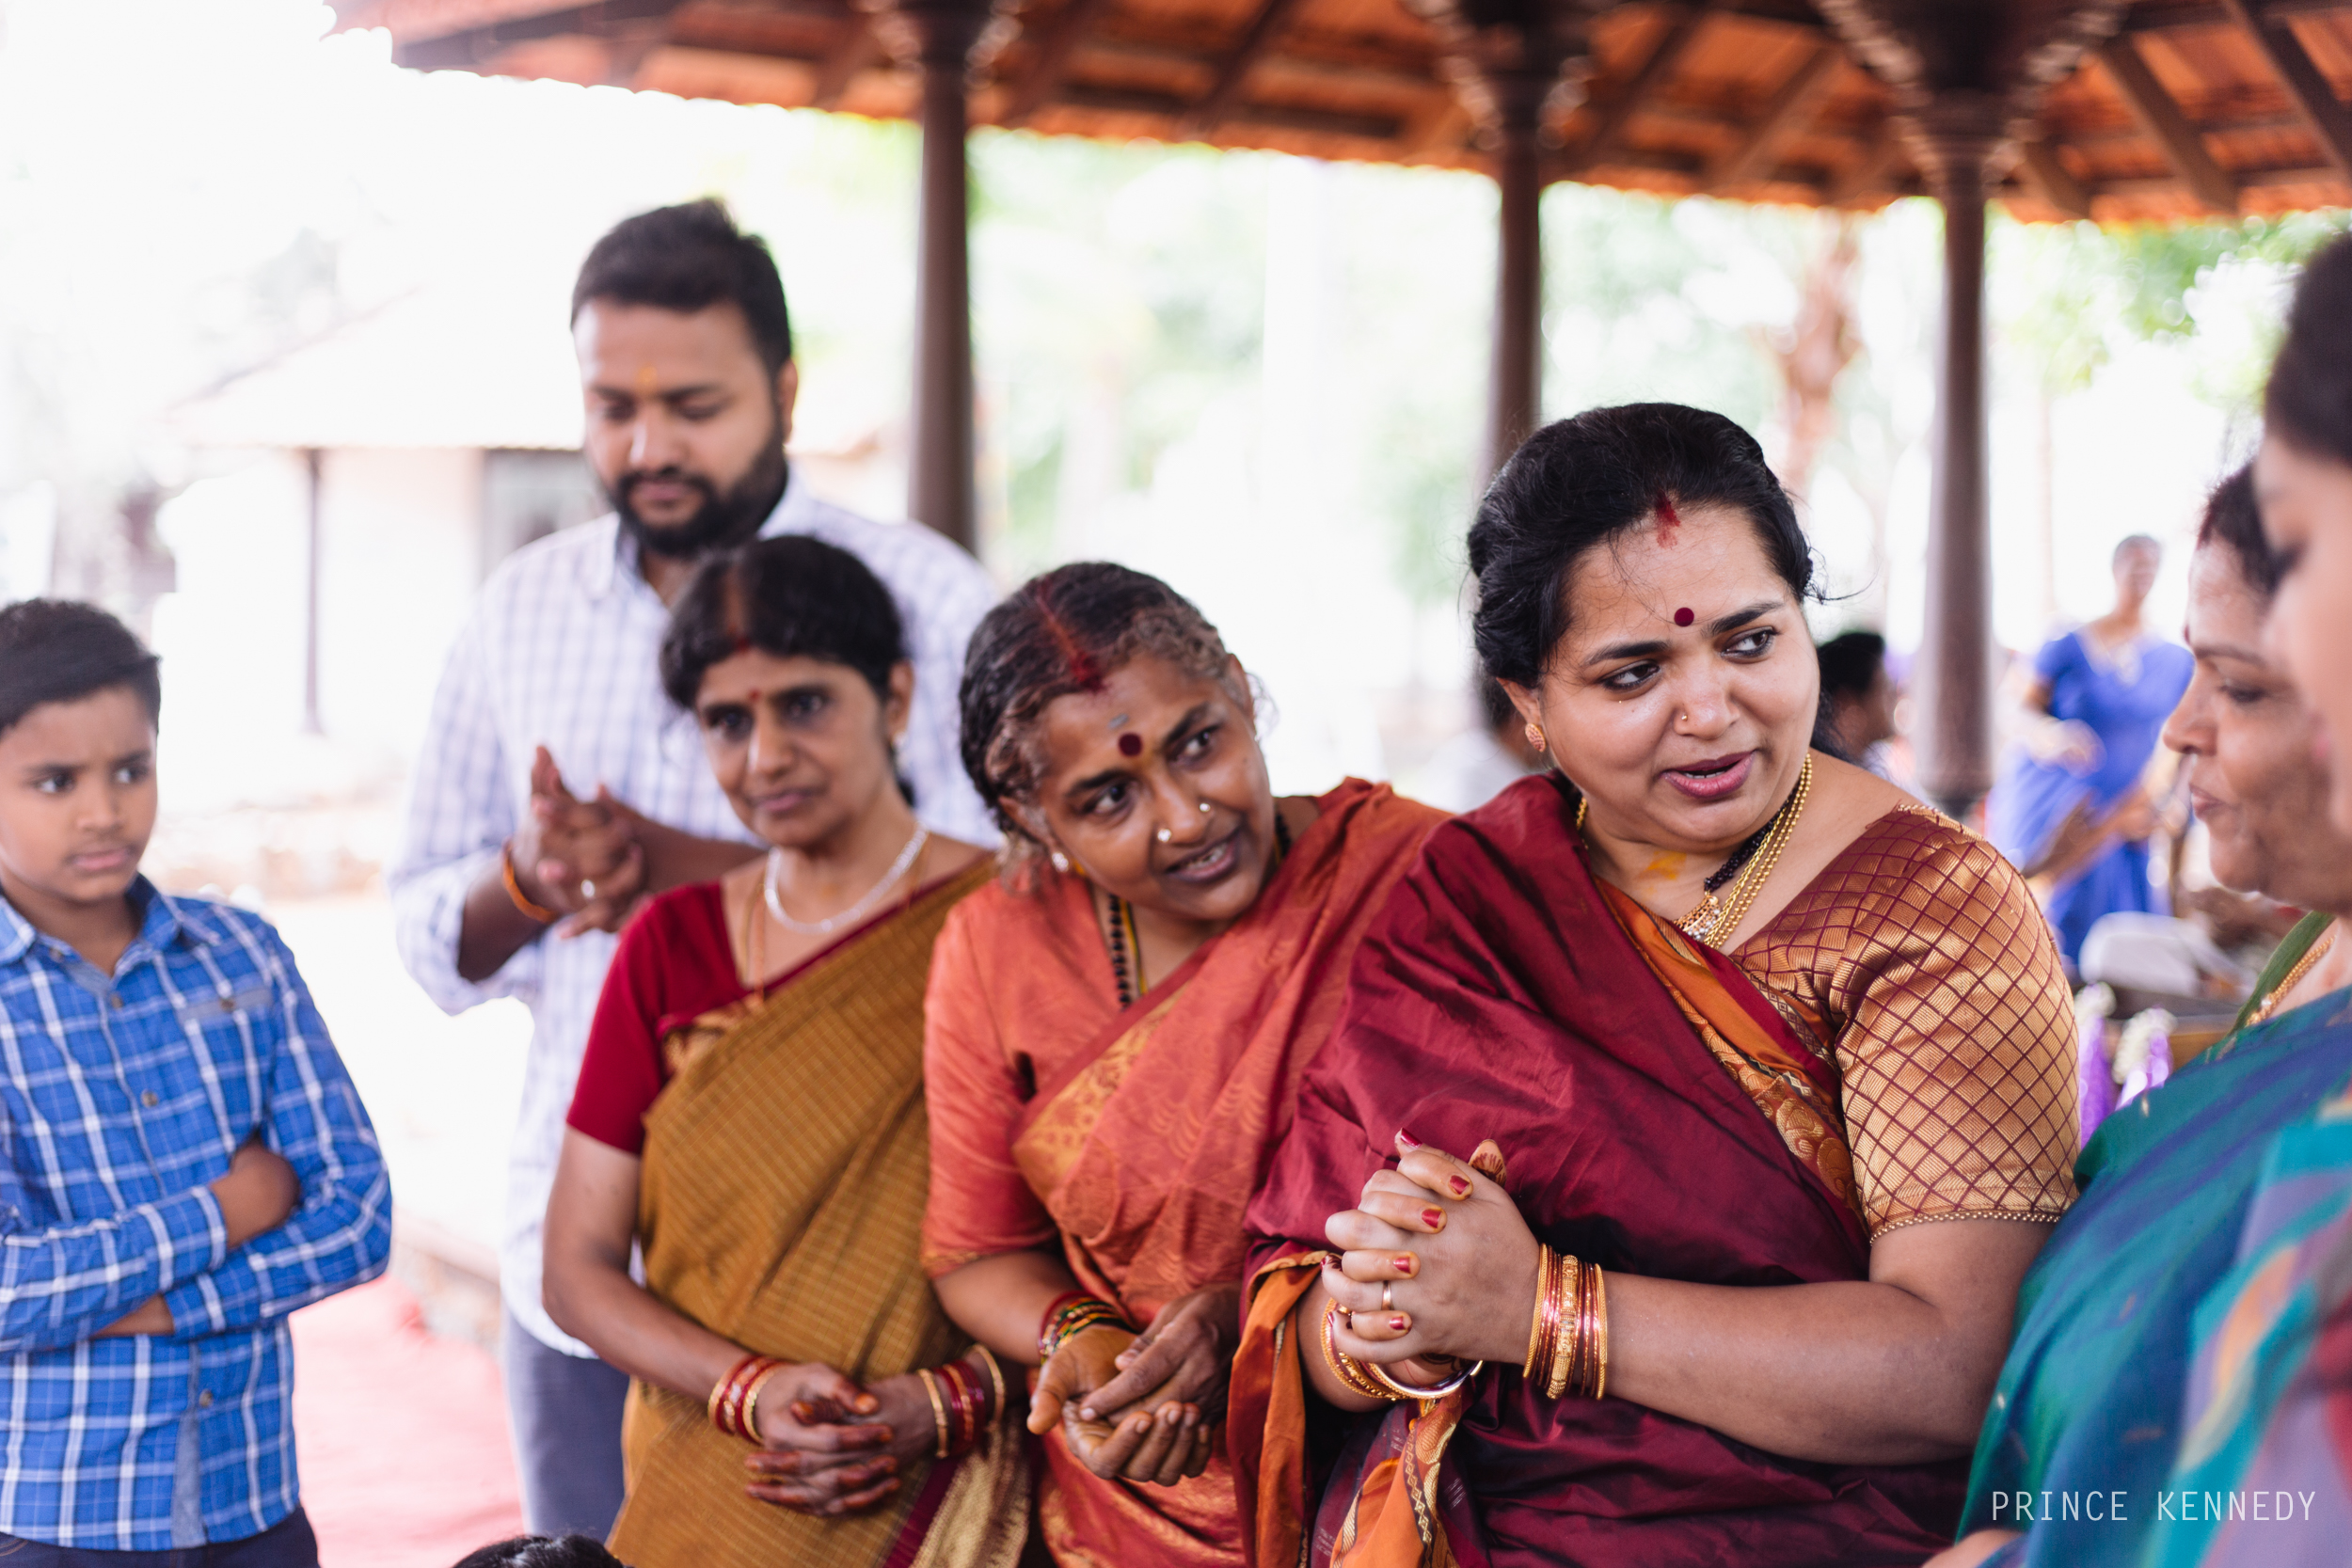 Athmajja-Nithesh-Engagement-Couple-Portrait-Portraiture-Wedding-Couple-Portrait-Chennai-Photographer-Candid-Photography-Destination-Best-Prince-Kennedy-Photography-125.jpg